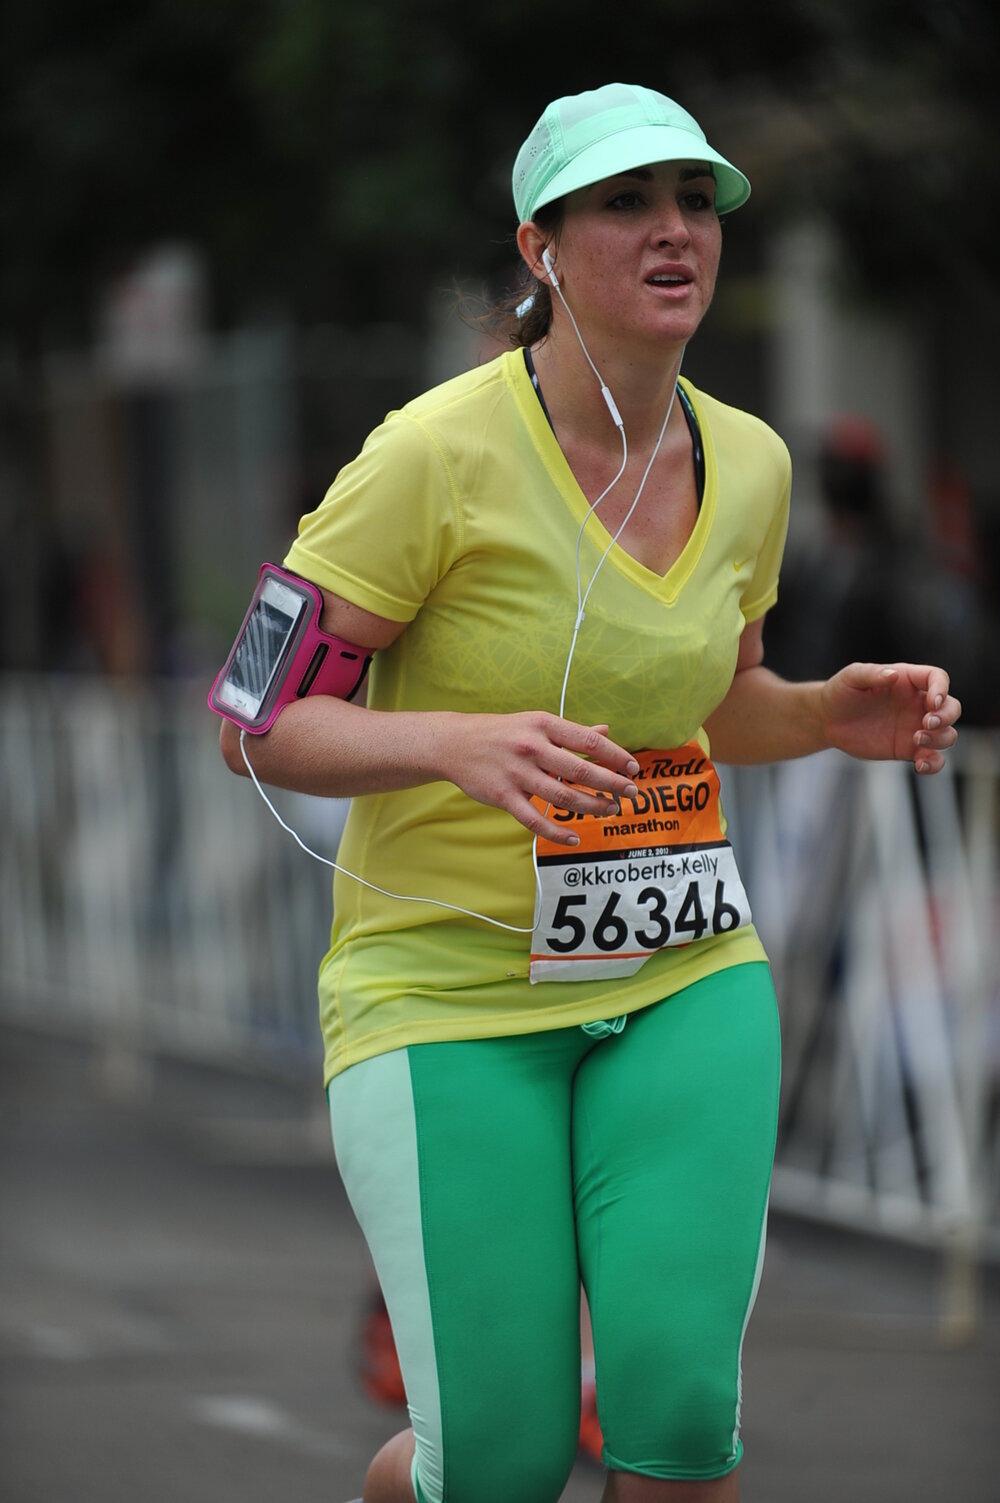 My first marathon. Trying to survive.